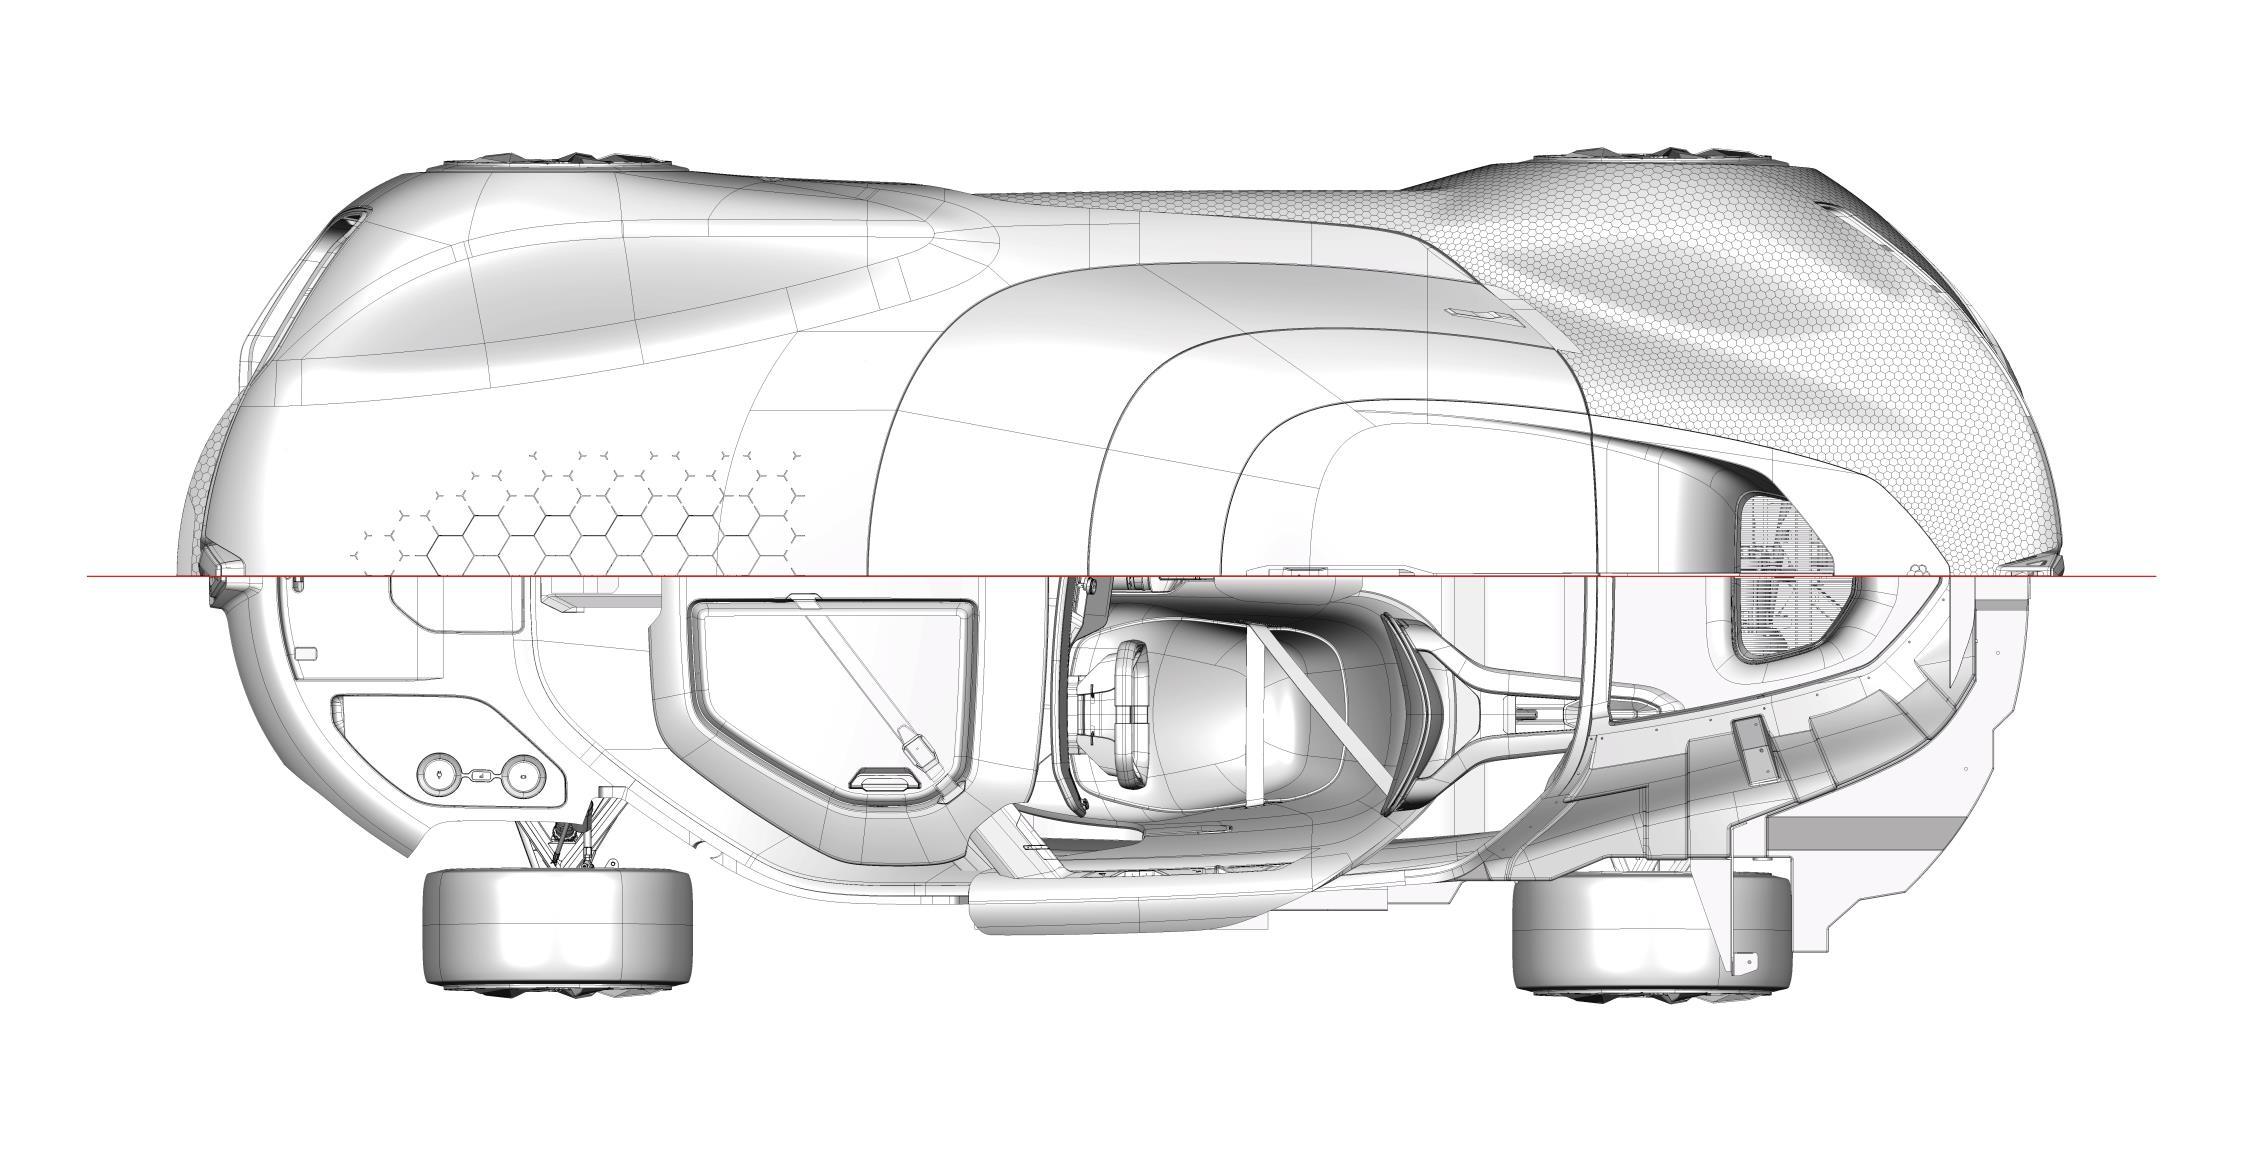 Trezor Concept - EMBARGO 08h15 UK Time 290916 (20).JPG